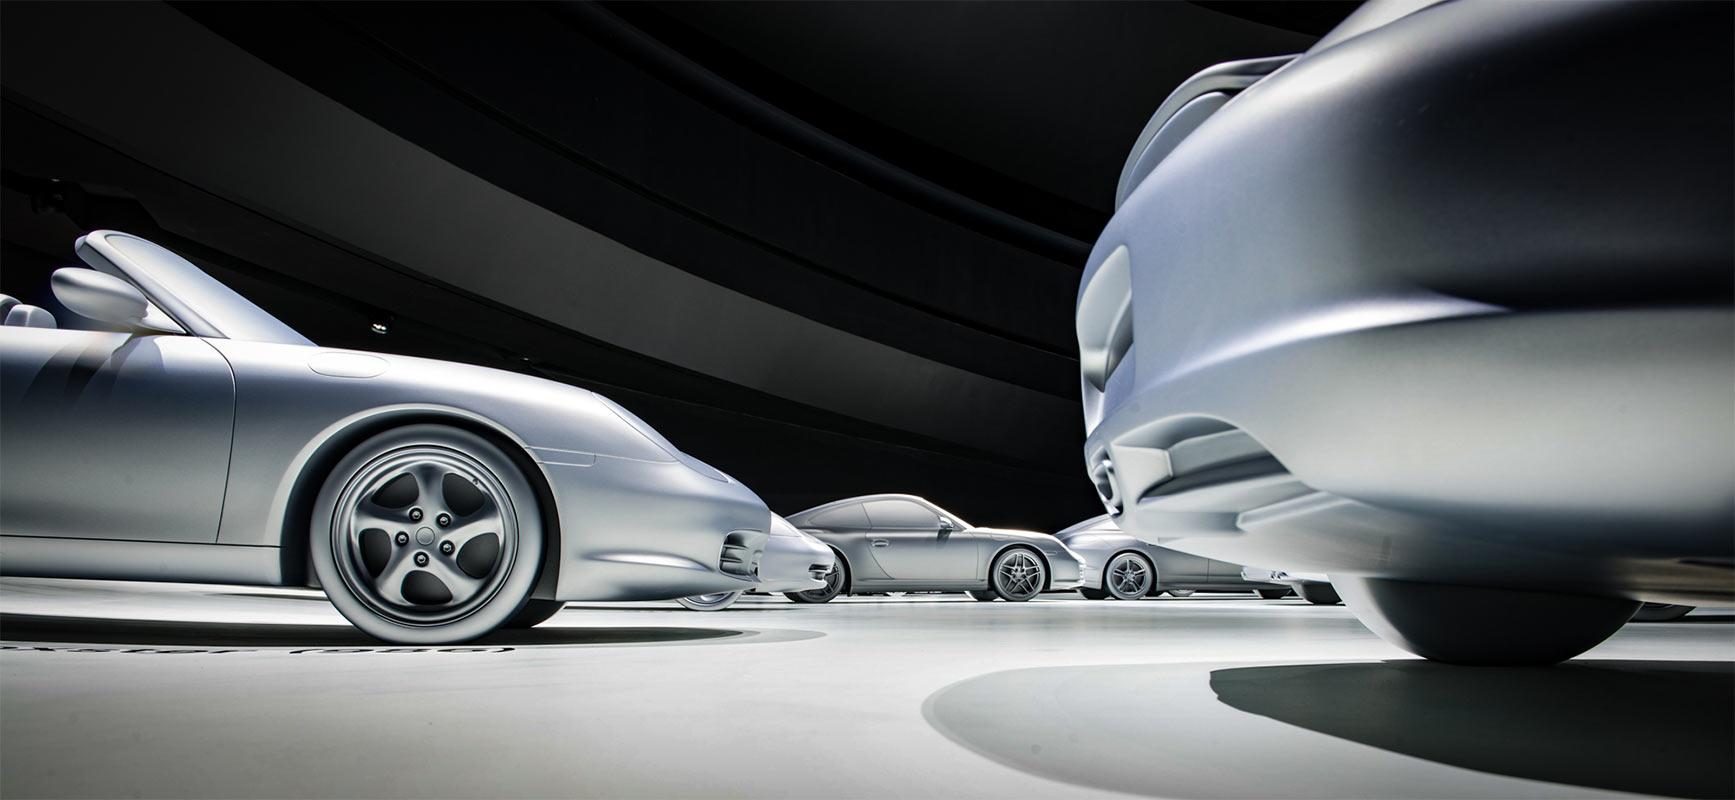 VW-Autowelt . Wolfsburg 2013 (Foto: Jens Gutberlet)